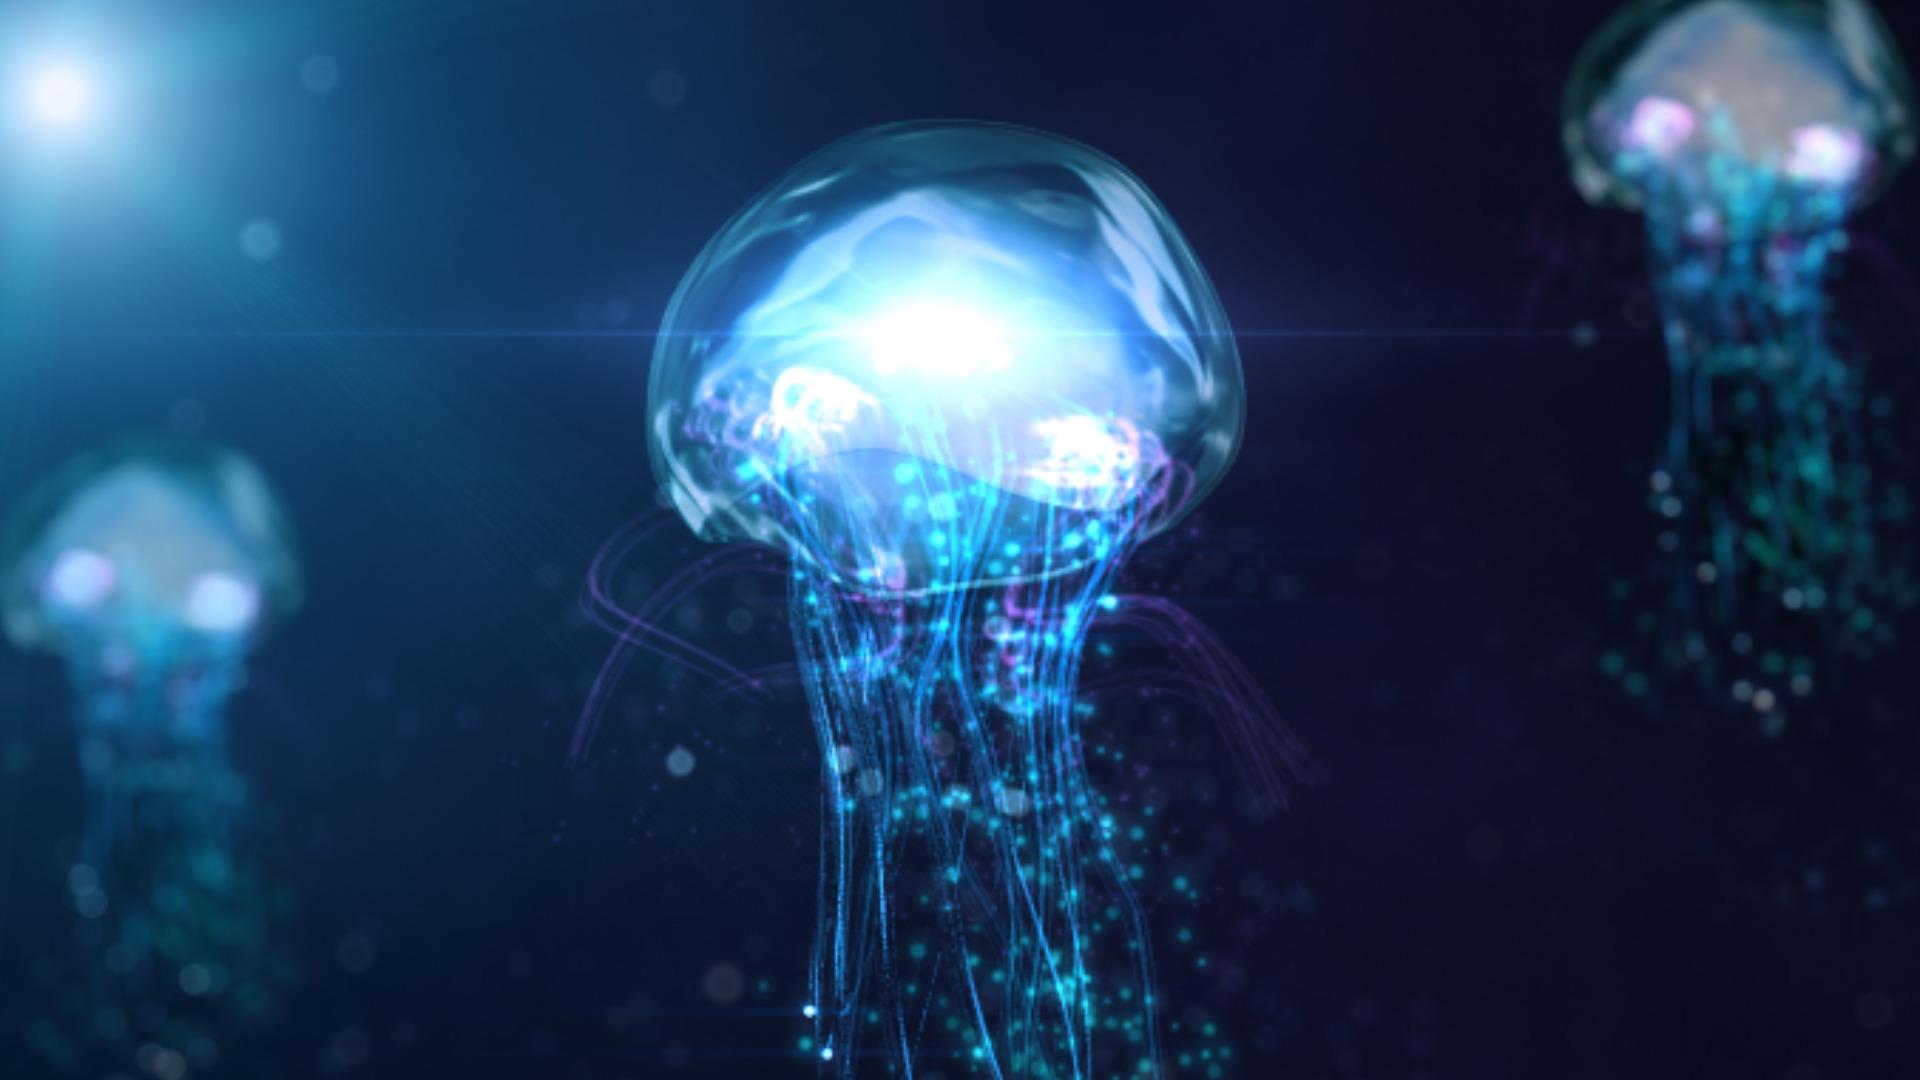 Download jellyfish wallpapers wallpaper electric jellyfish for Jellyfish wallpaper home